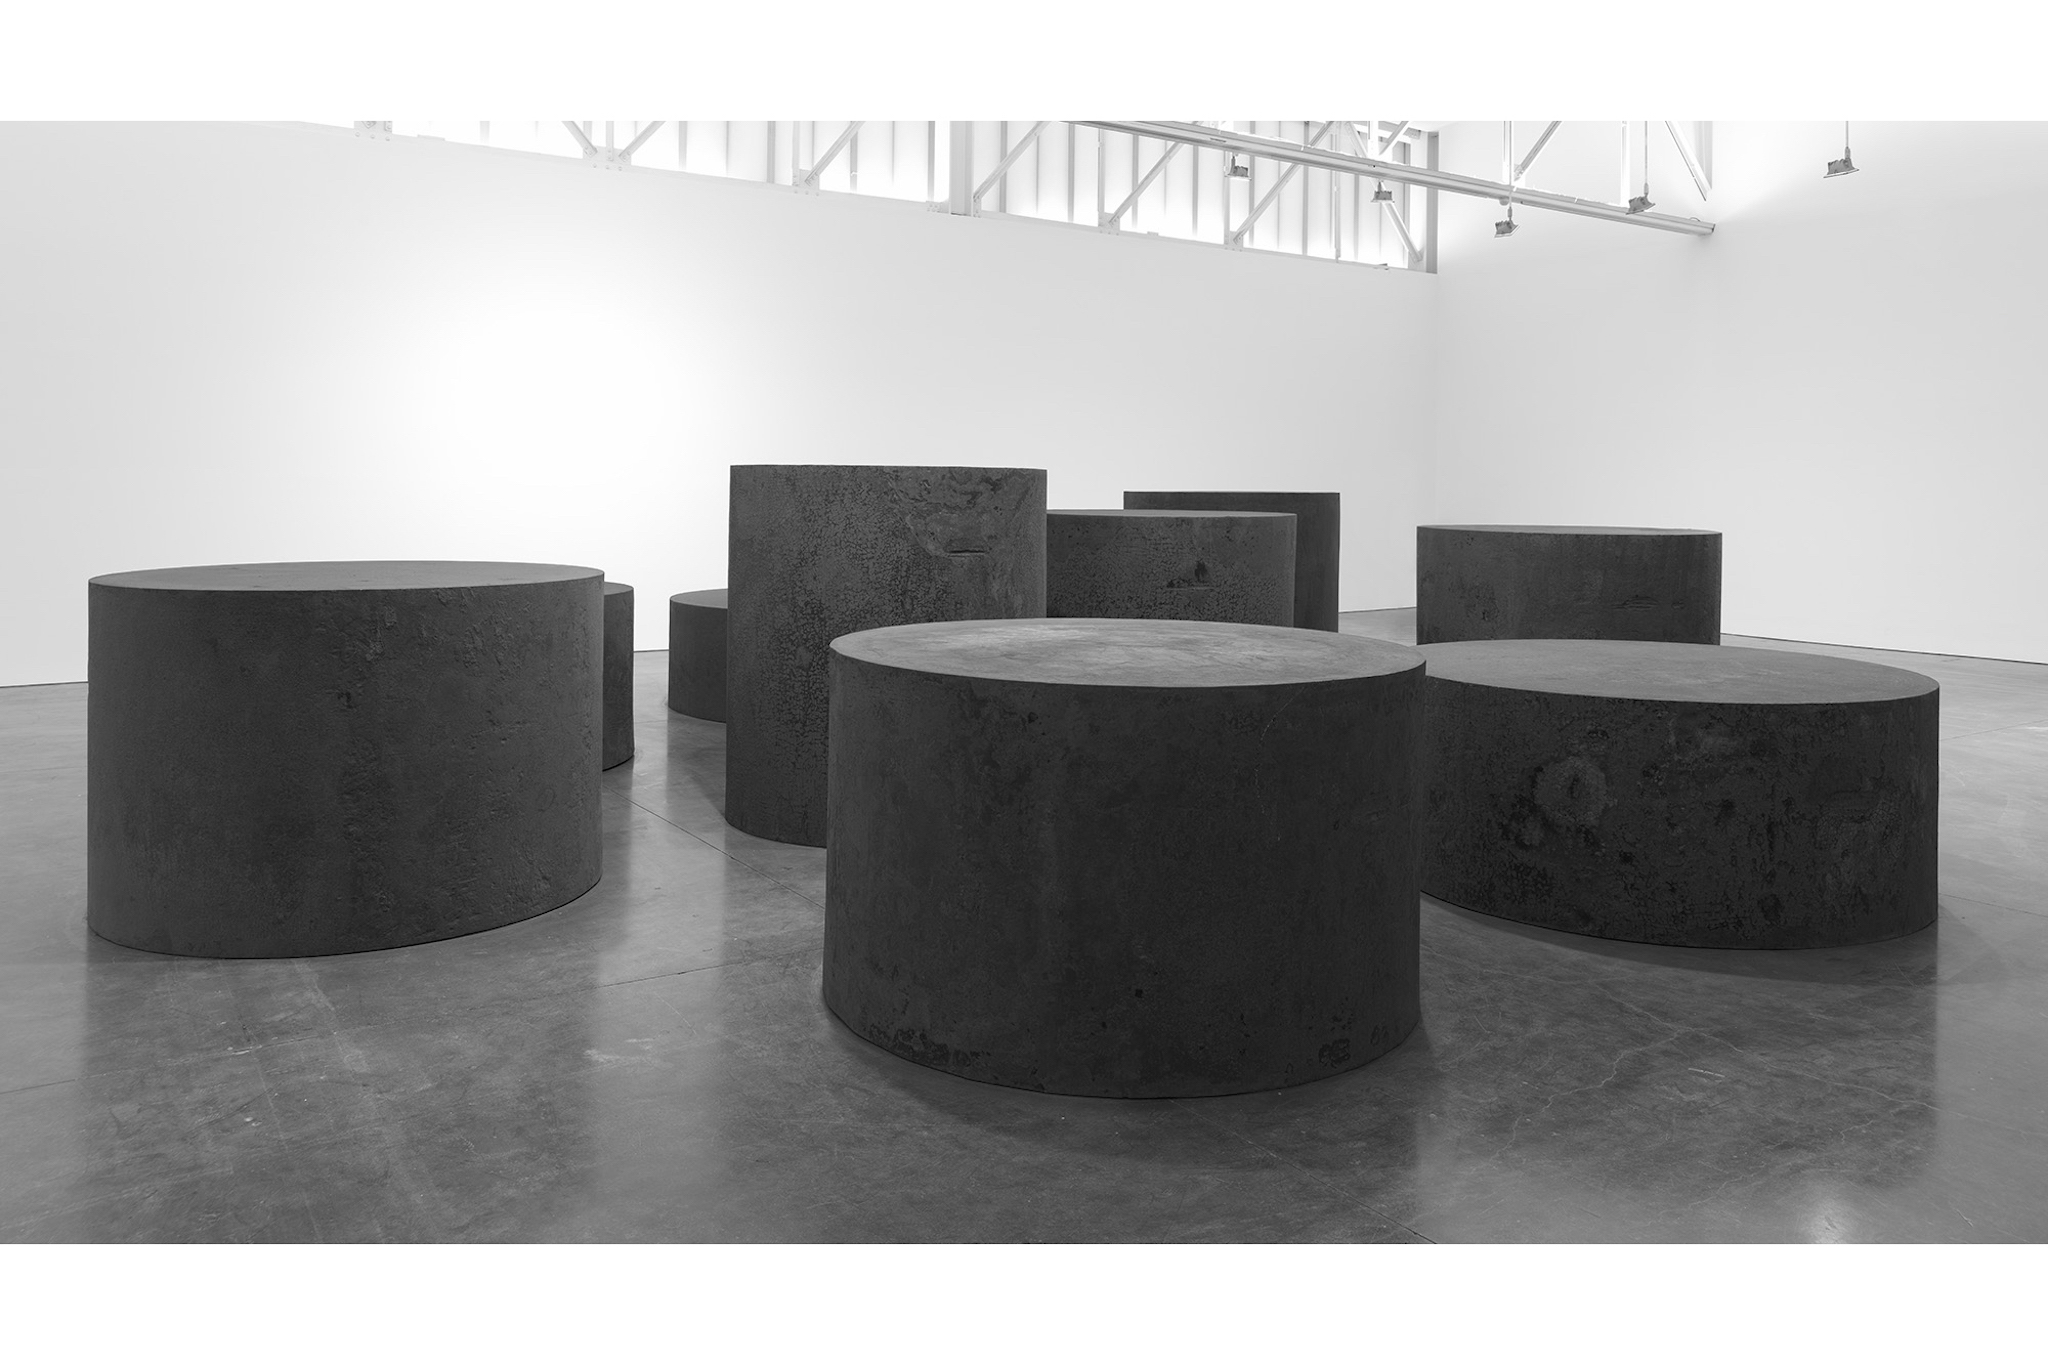 Richard Serra, Nine, 2019